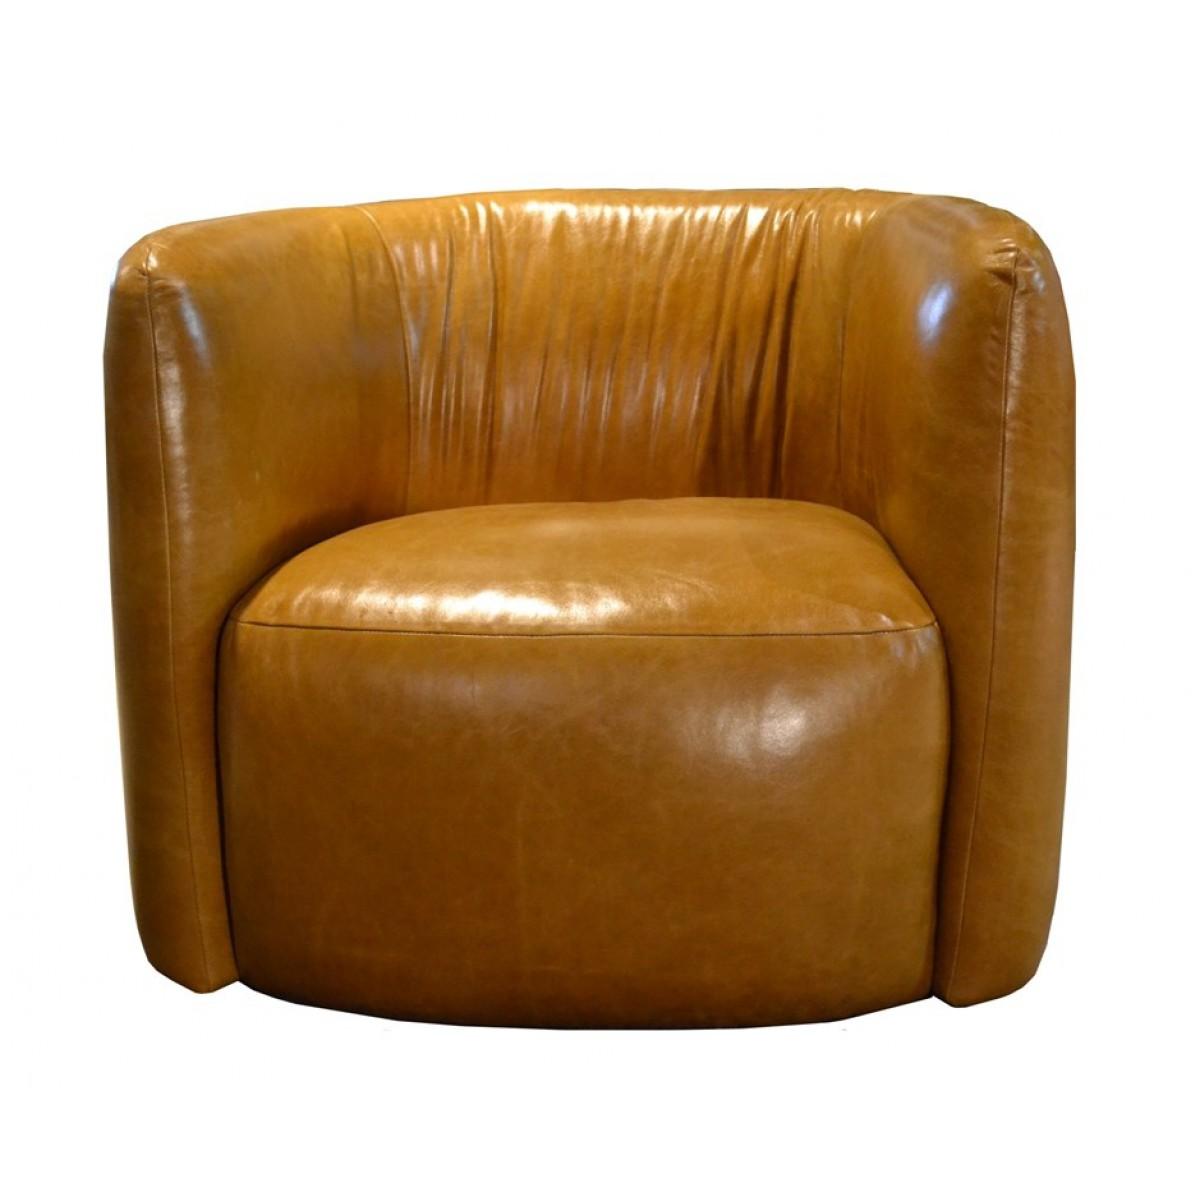 fauteuil_trias_tribeca_leder_cognac_dasilva_tabacco_easy_sofa_tom_club_collection_online